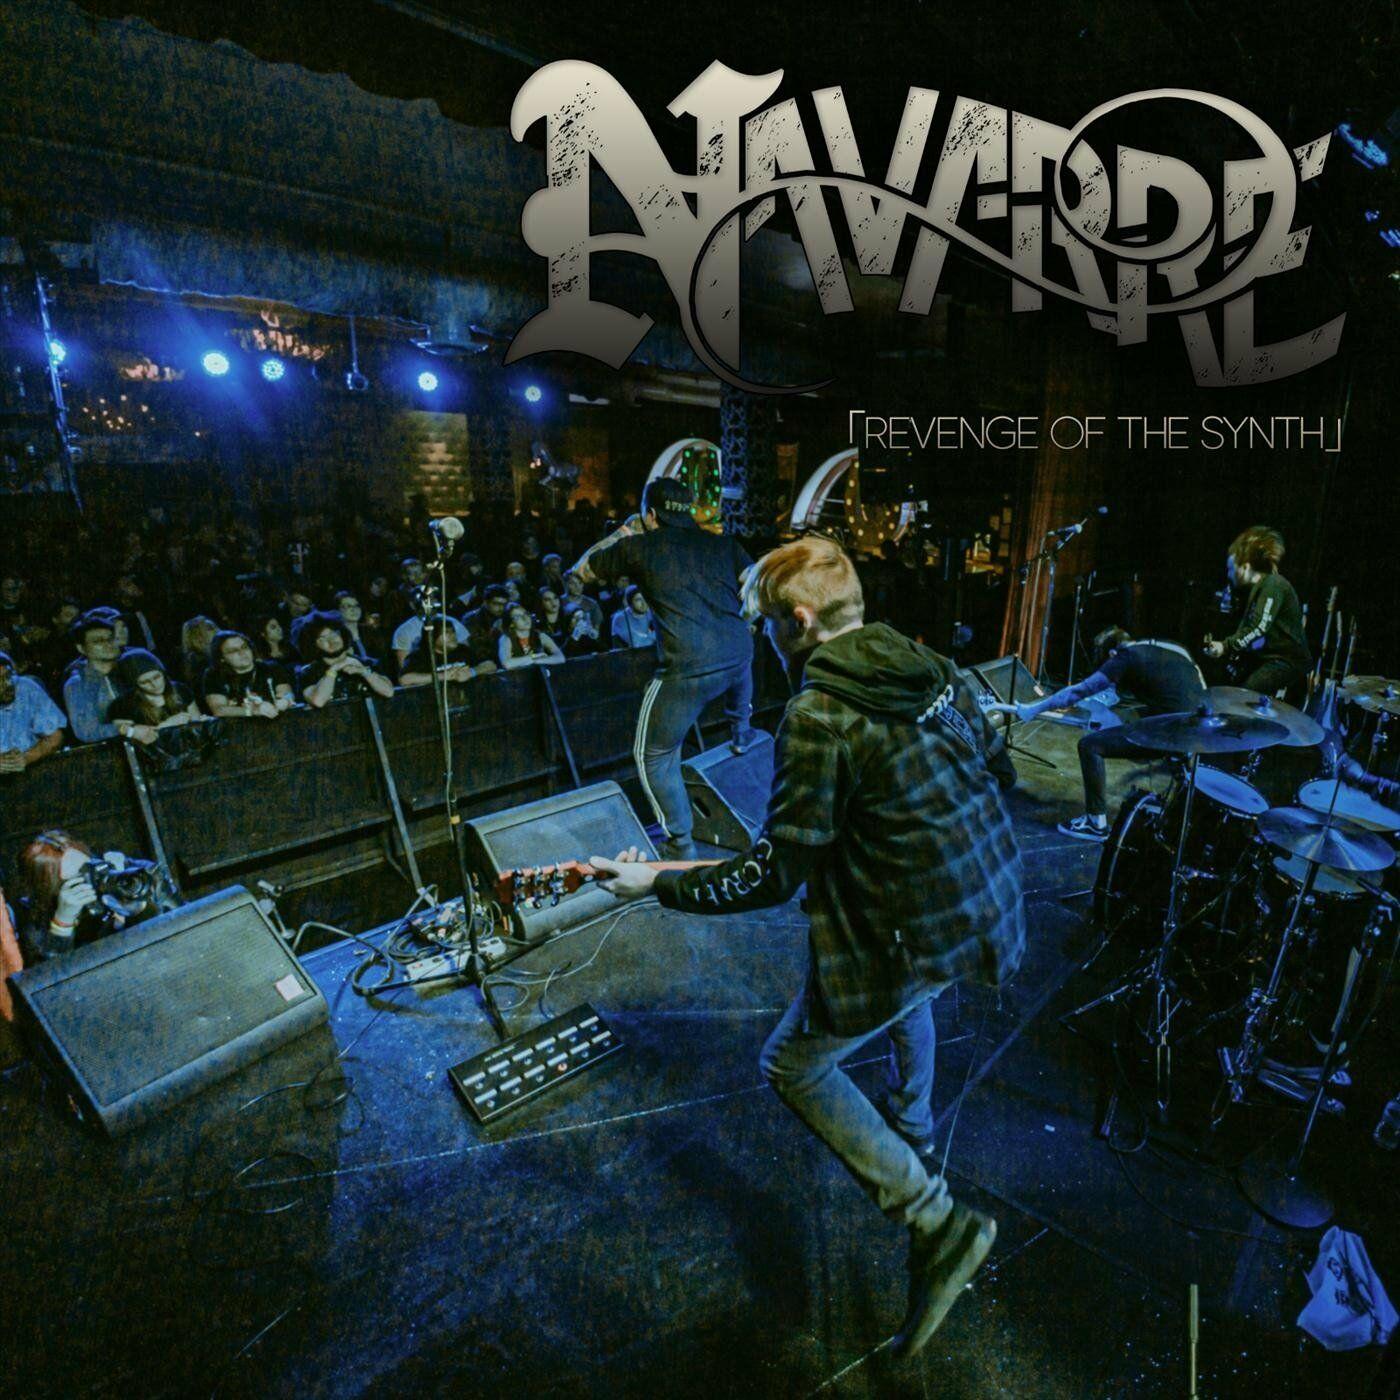 Navarre - Revenge of the Synth [single] (2020)